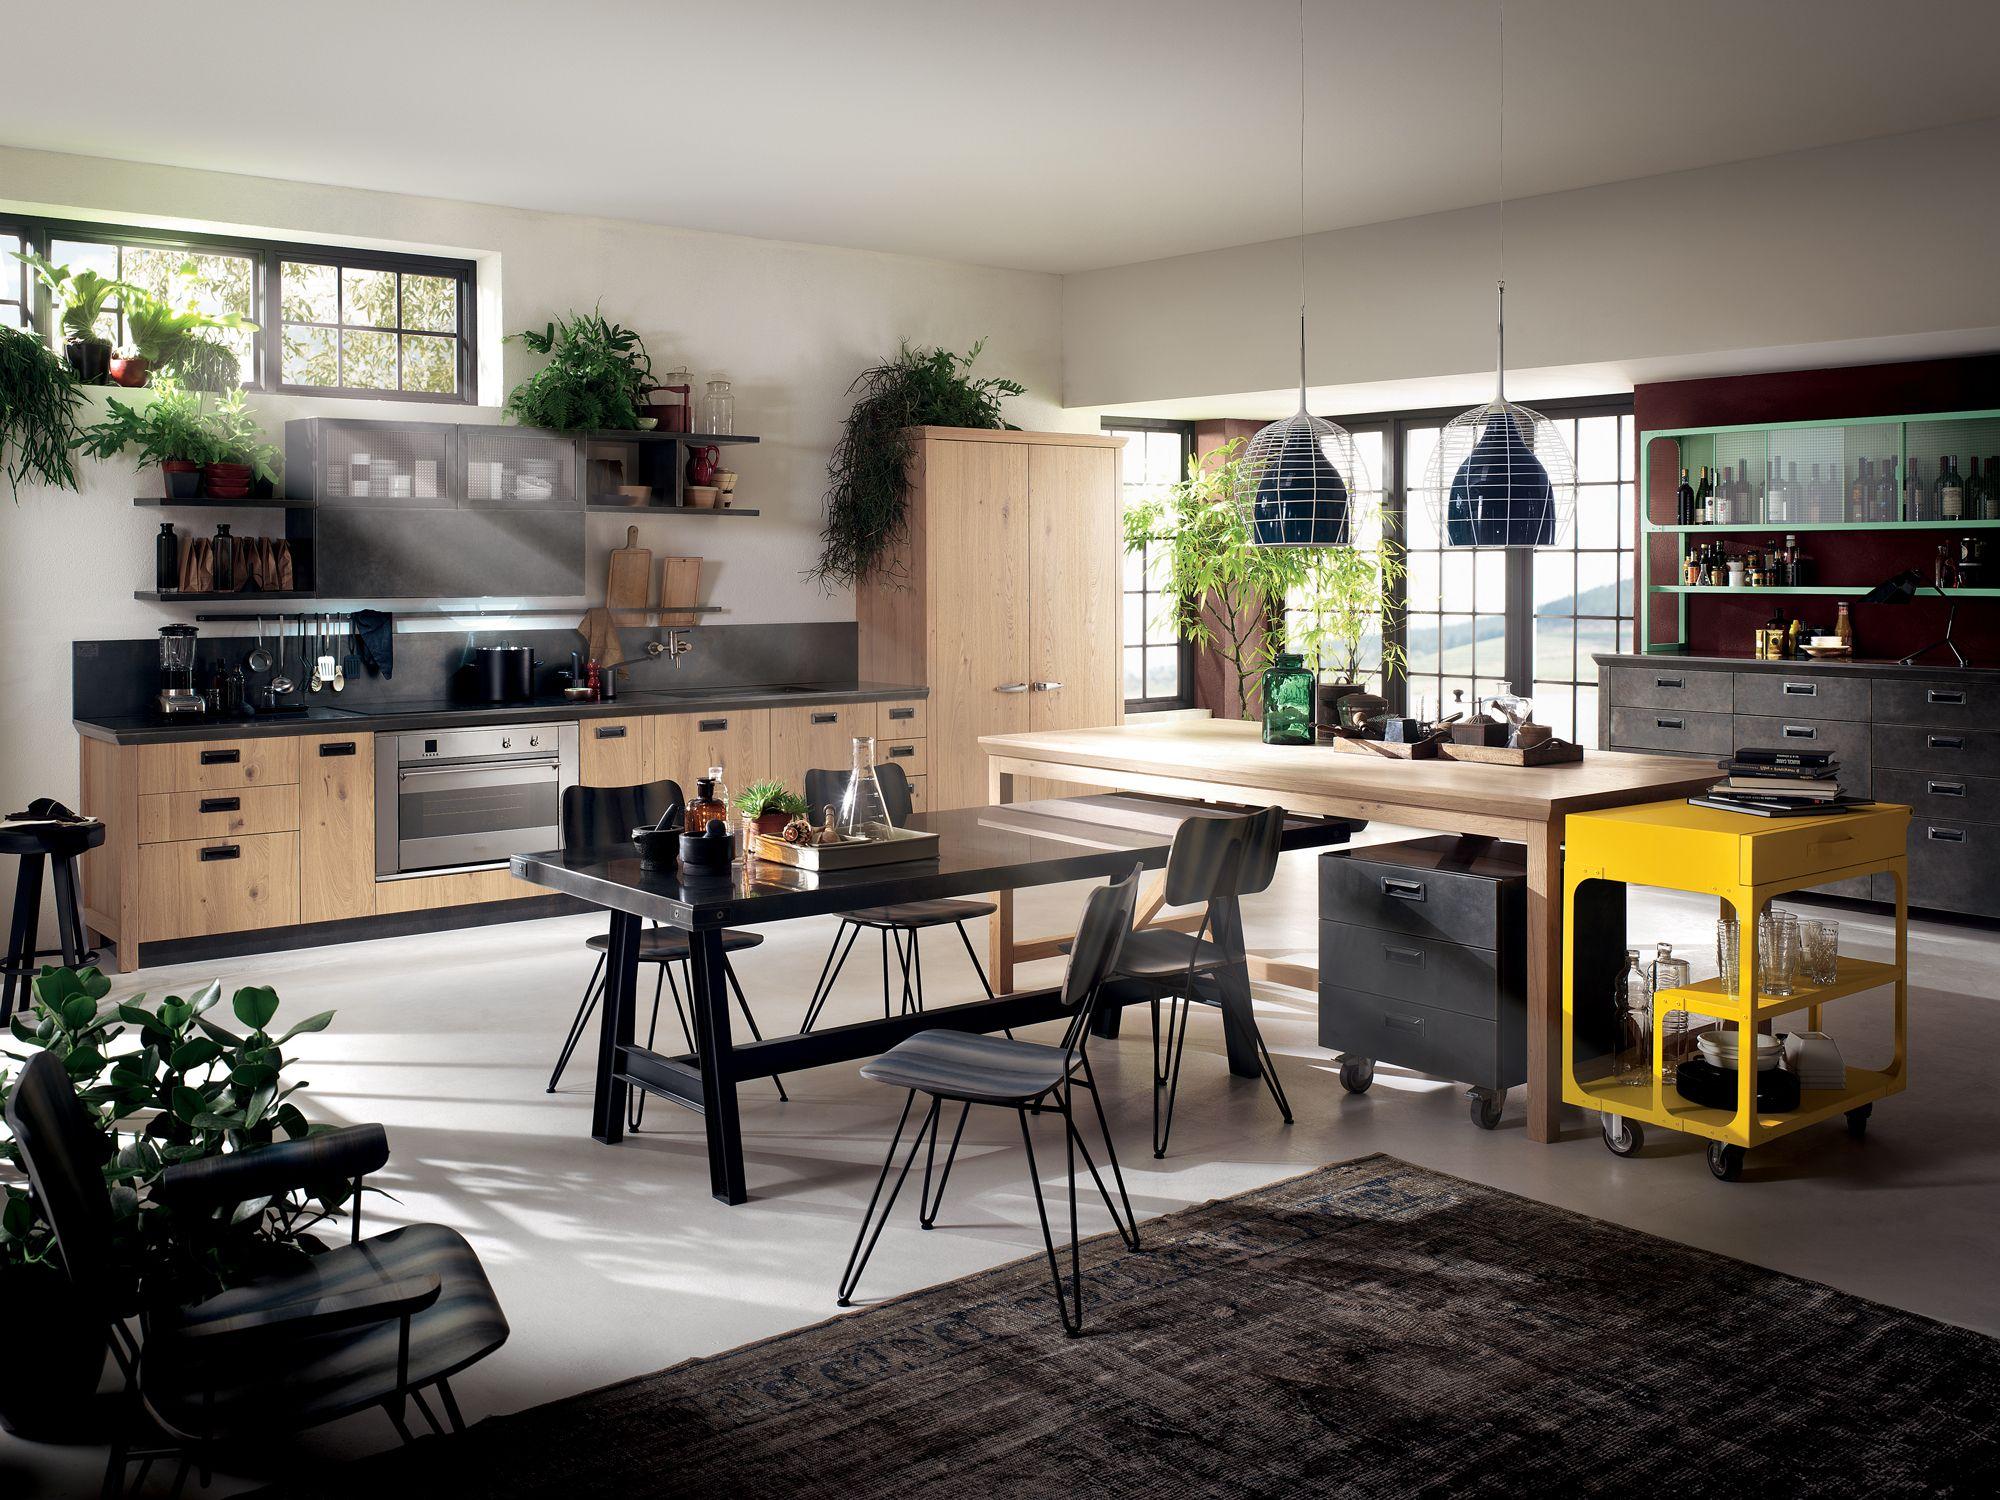 Scavolini   Arredo cucine e living   Archiproducts